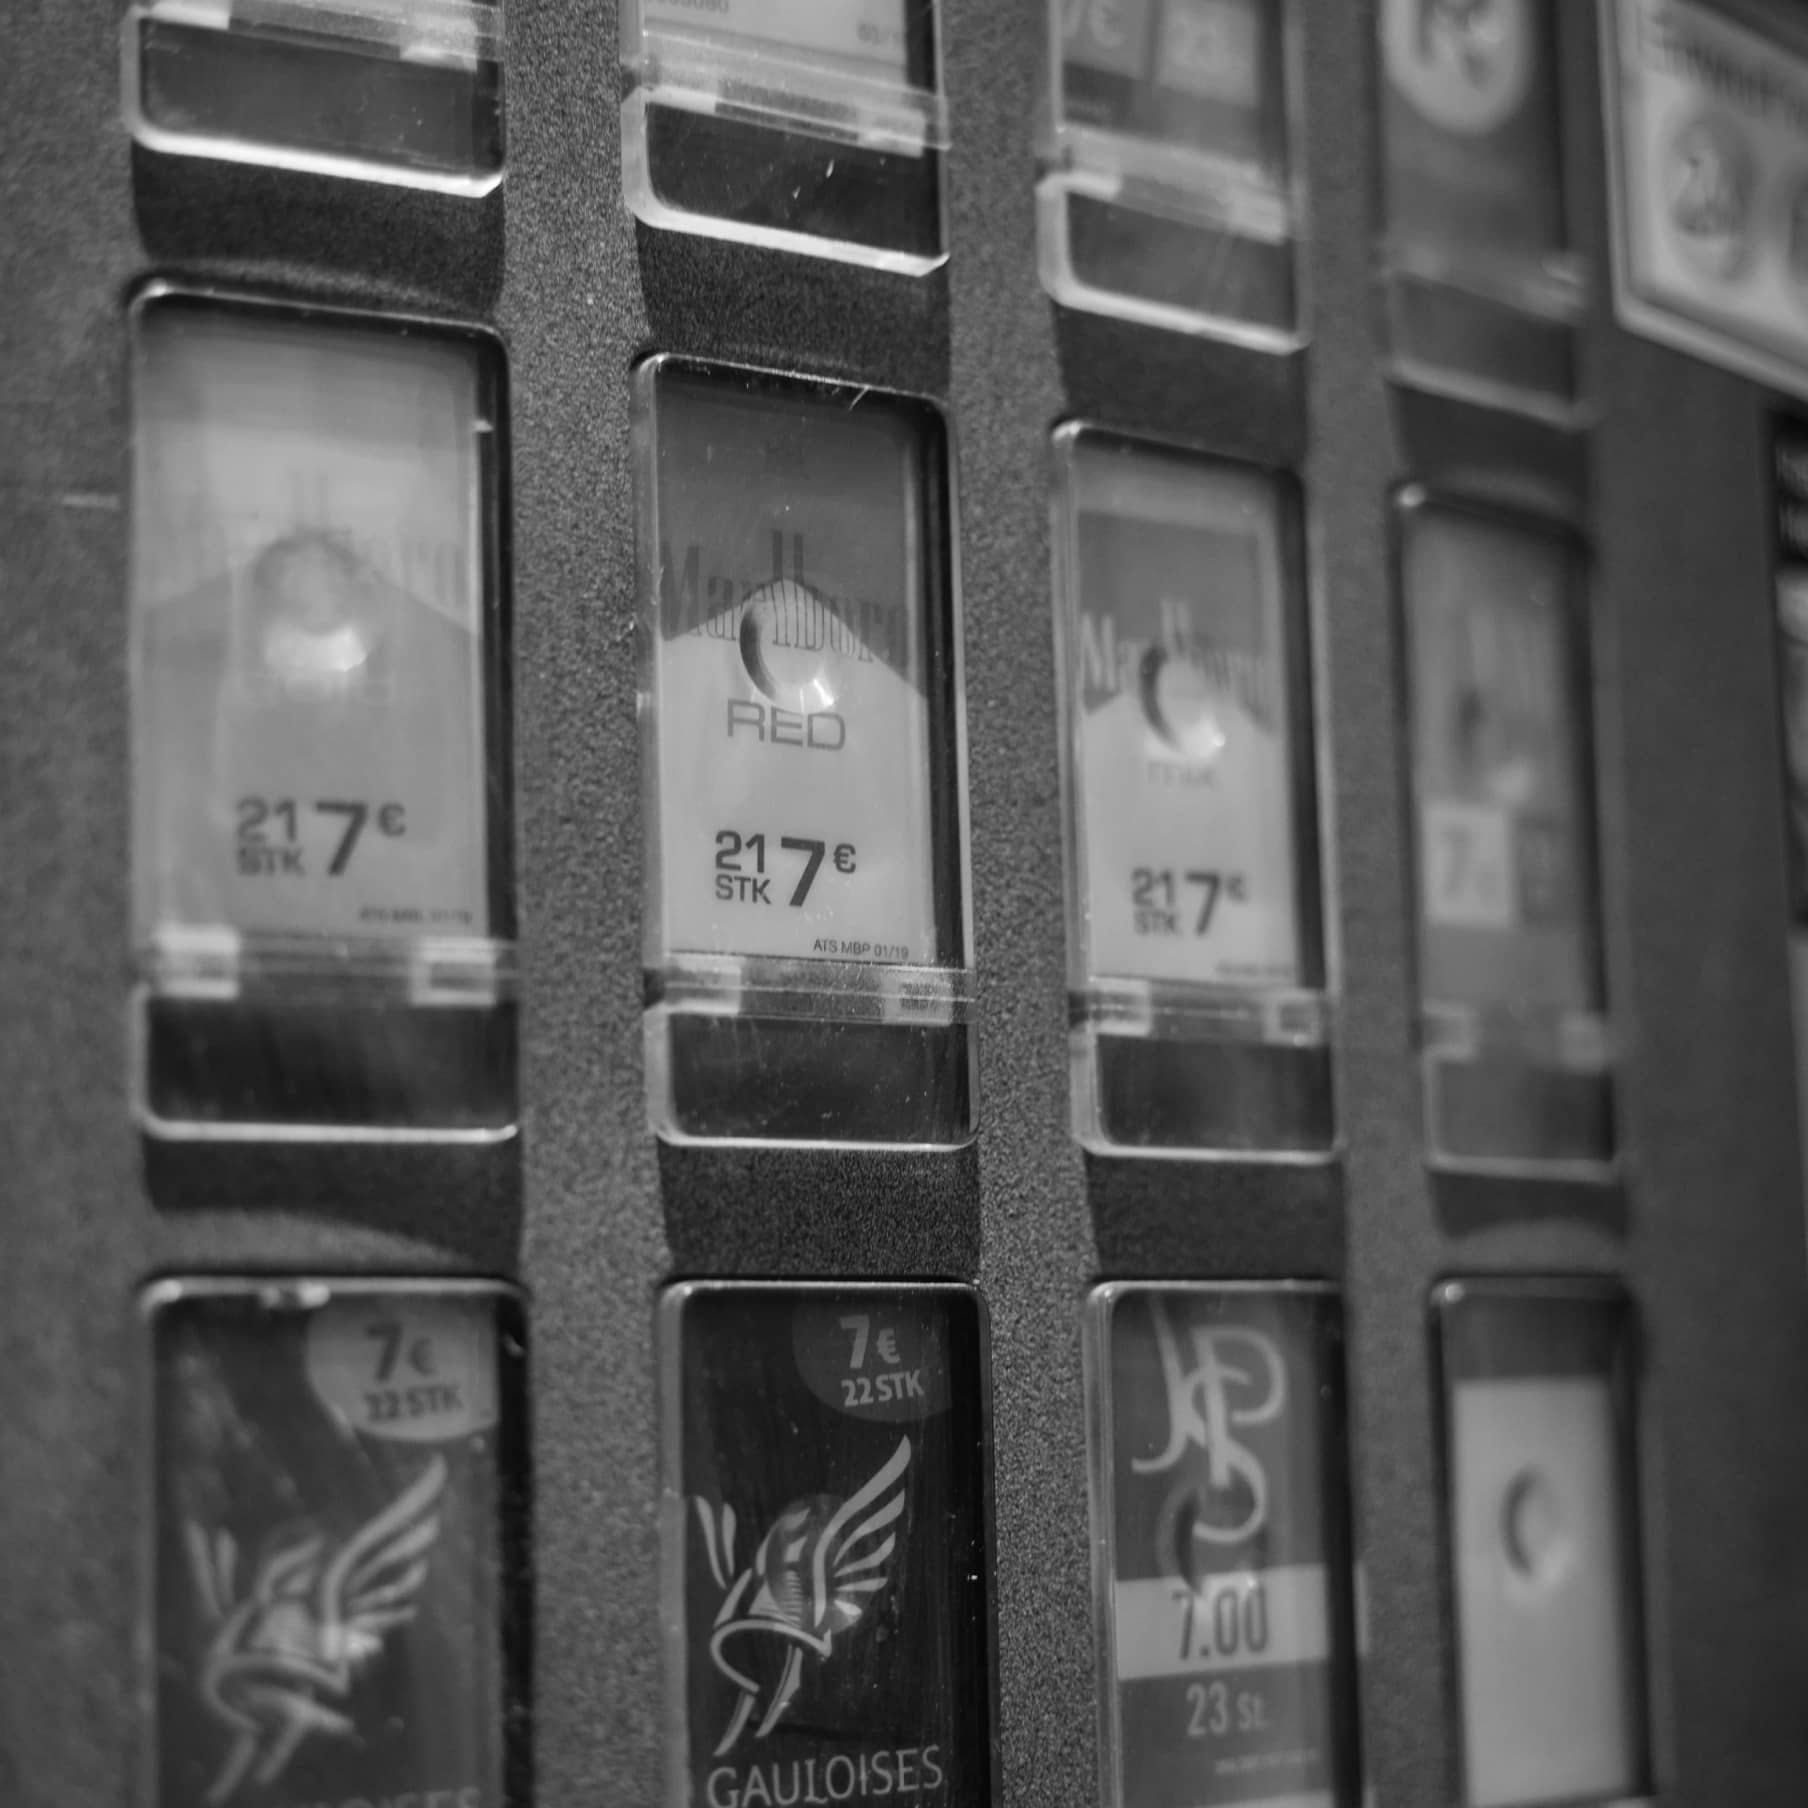 Retro Zigarettenautomat in Schwarz-weiß